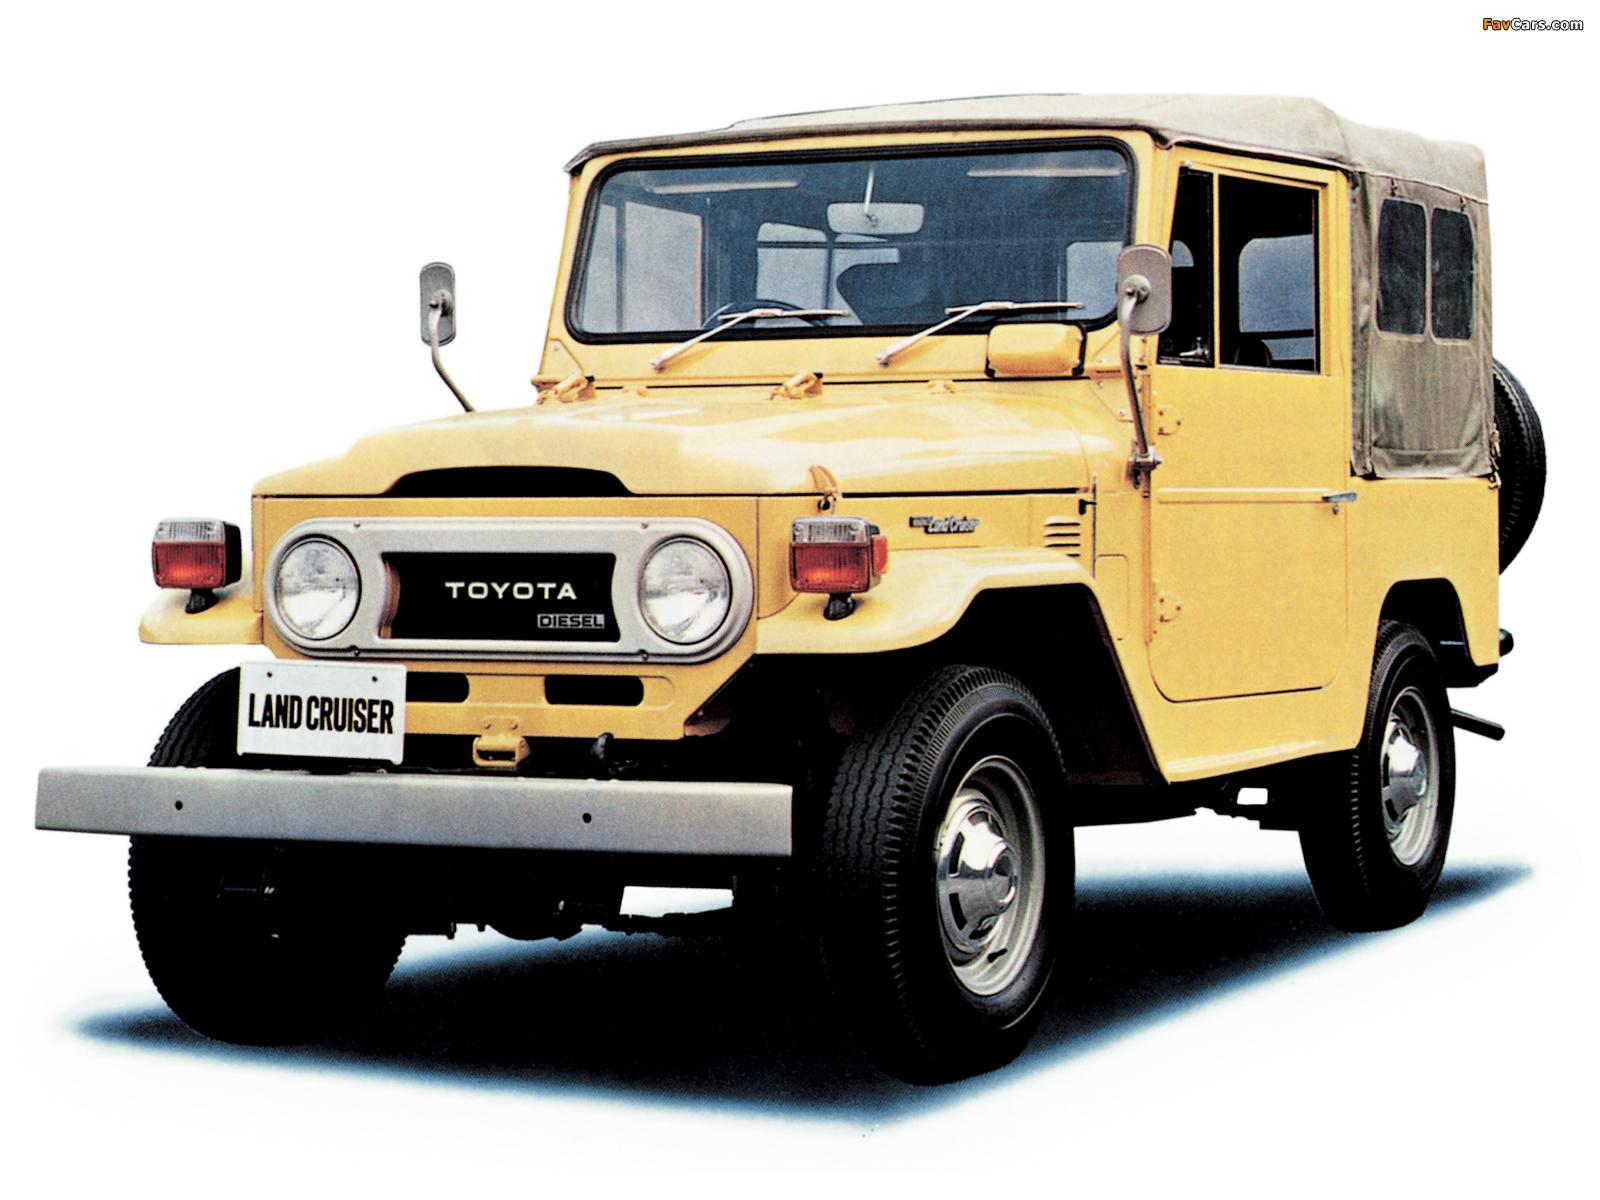 Wallpapers Of Toyota Land Cruiser Bj40 1973 79 1600x1200